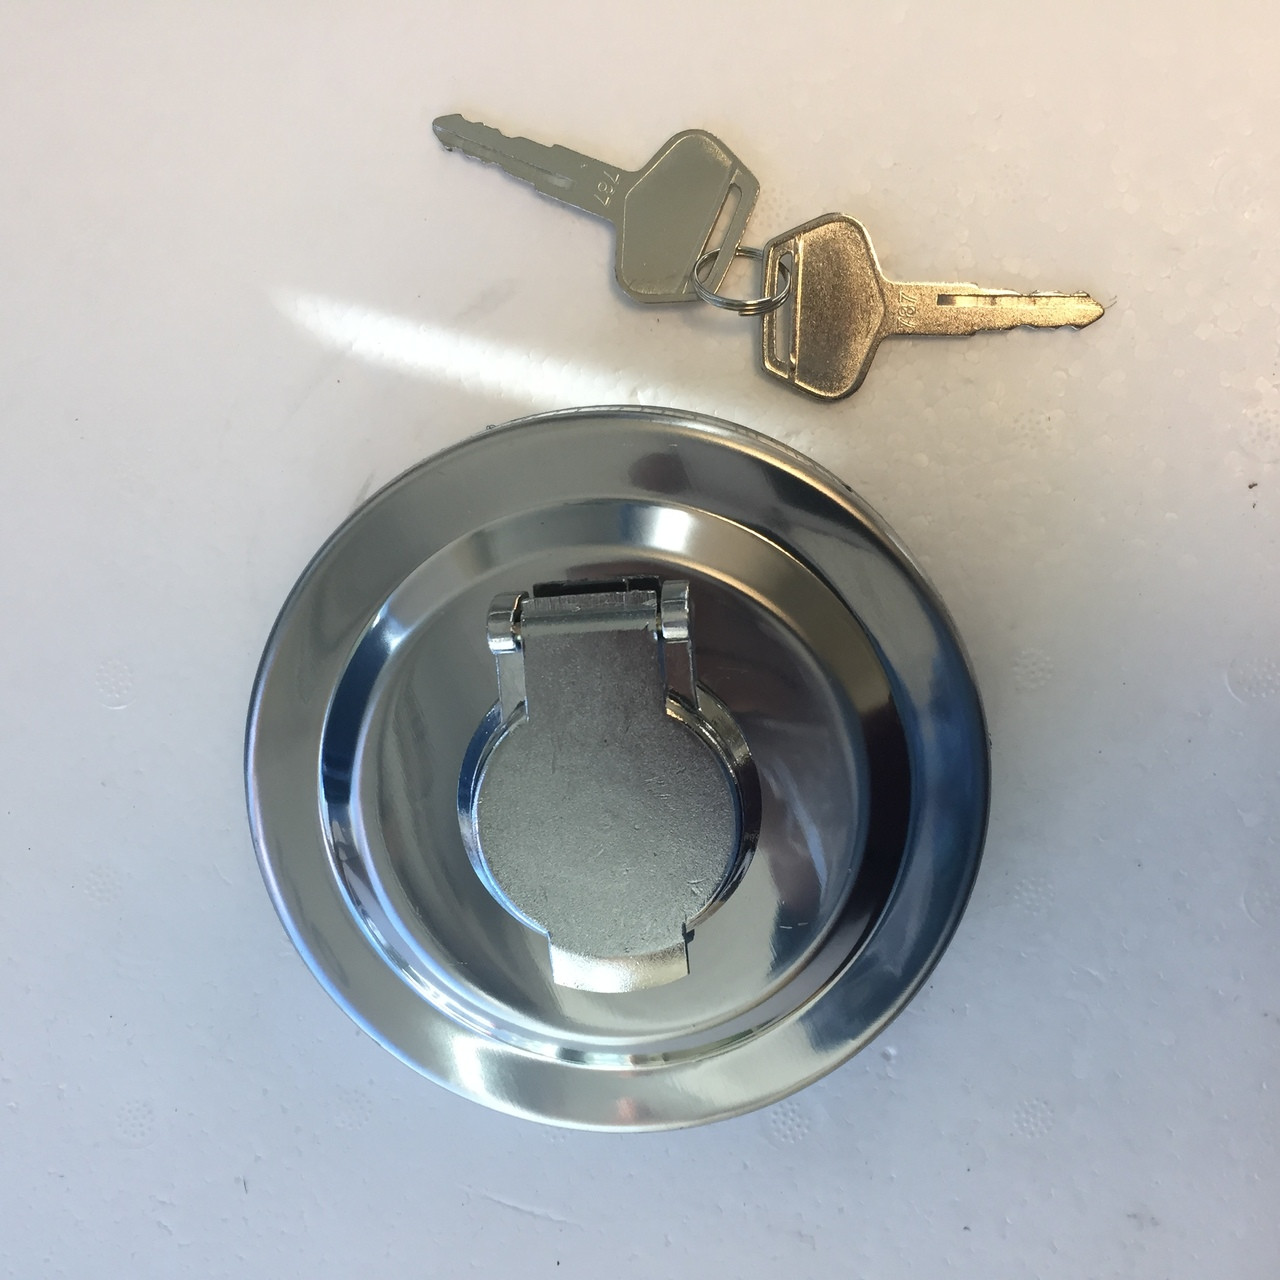 NEW---Fuel Cap with 2 Keys for Komatsu PC200-2 PC200-3 PC200-5 PC200-6 Excavator